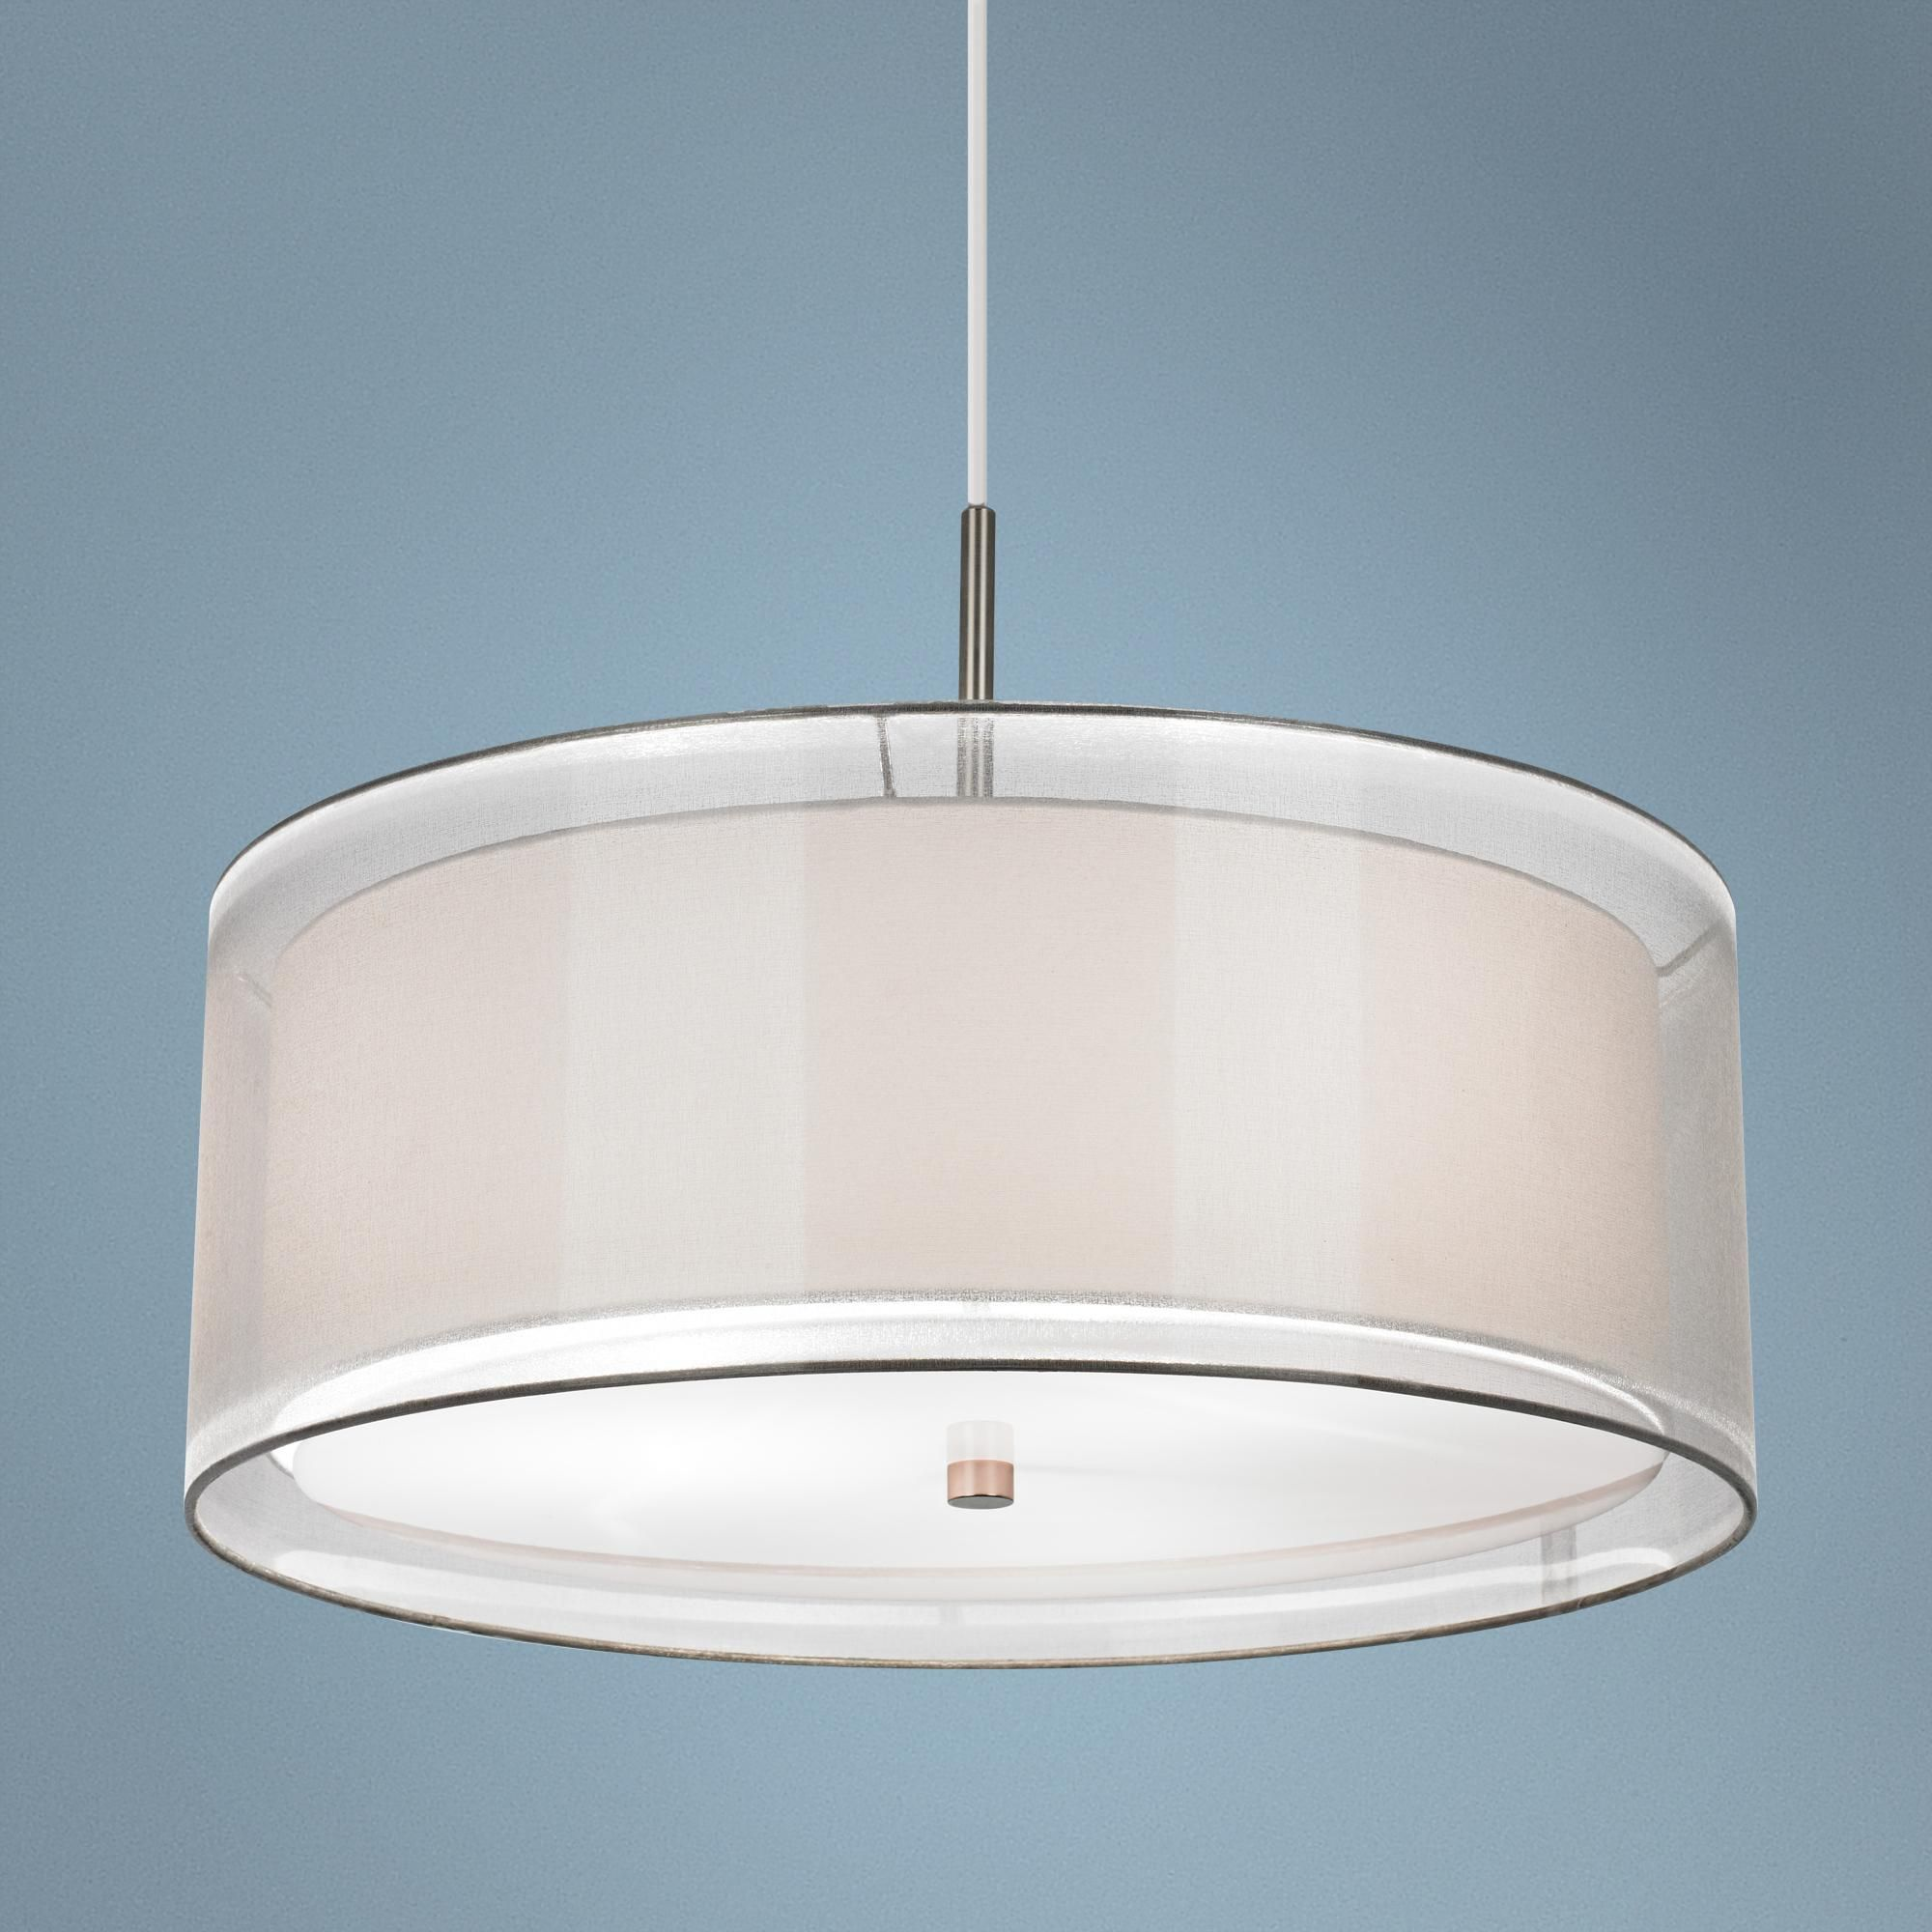 Possini euro double drum 20 wide white pendant light brushed dining room light fixtures arubaitofo Choice Image